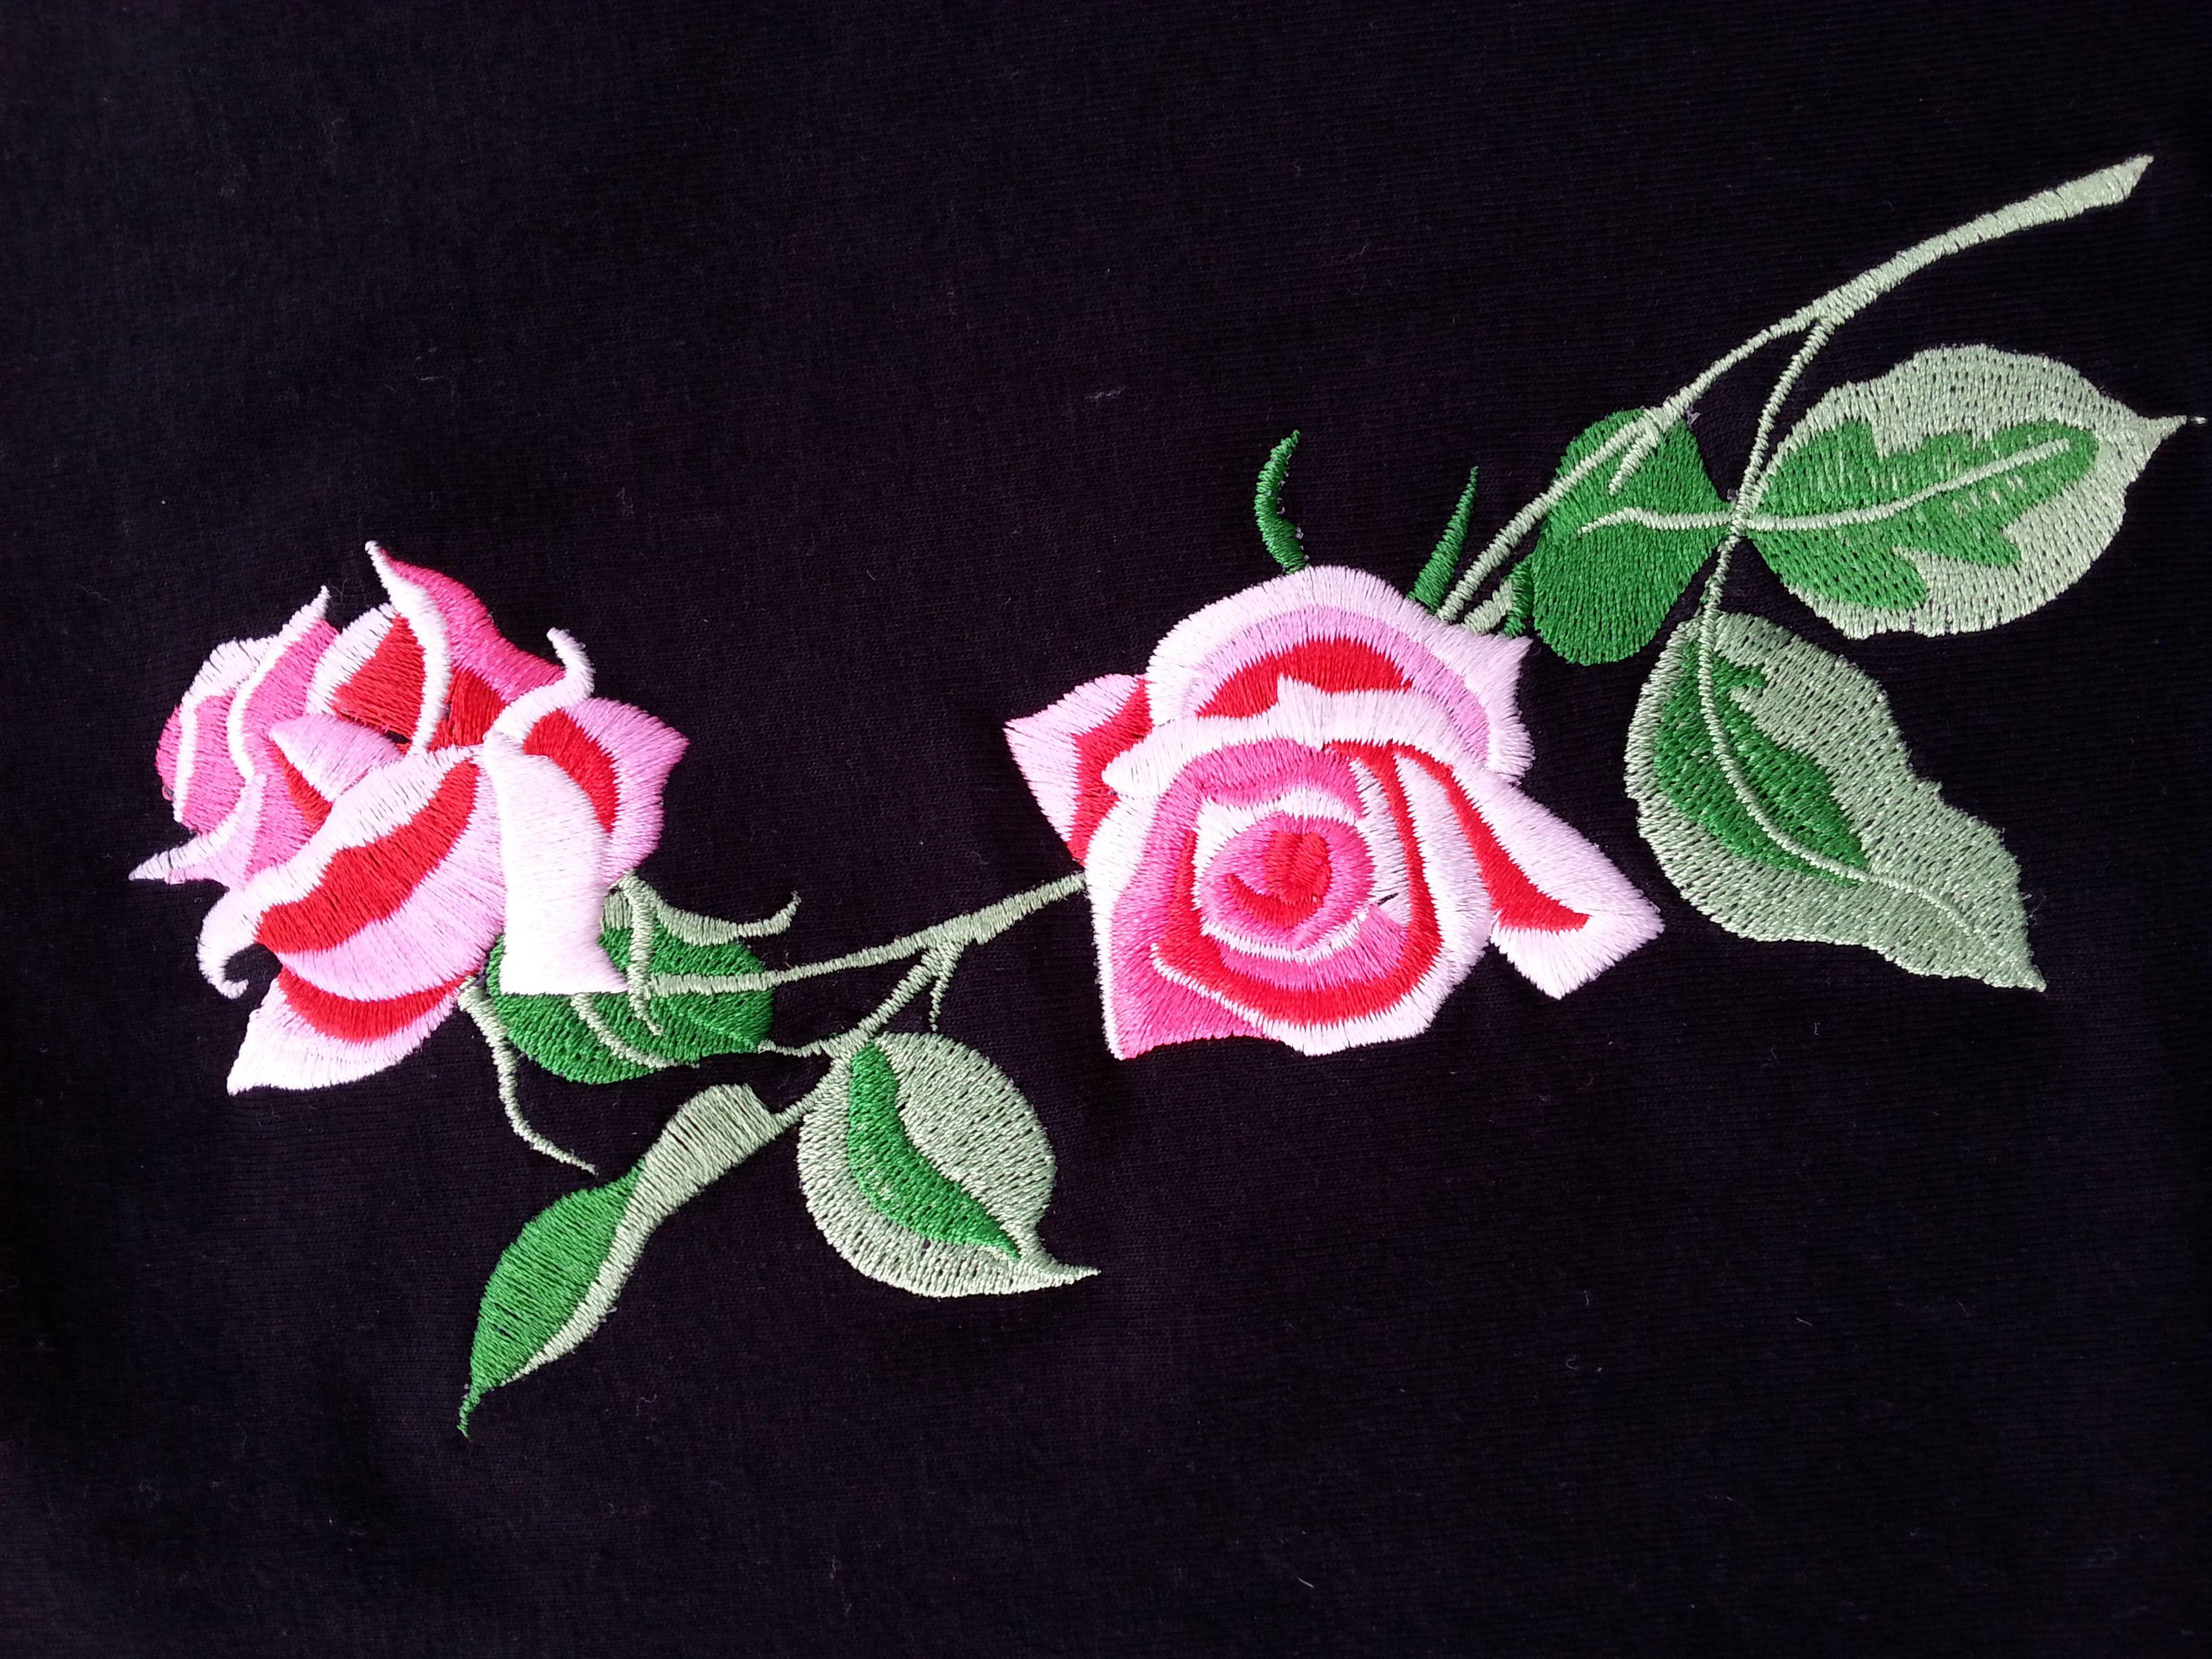 Borduursel embroidery